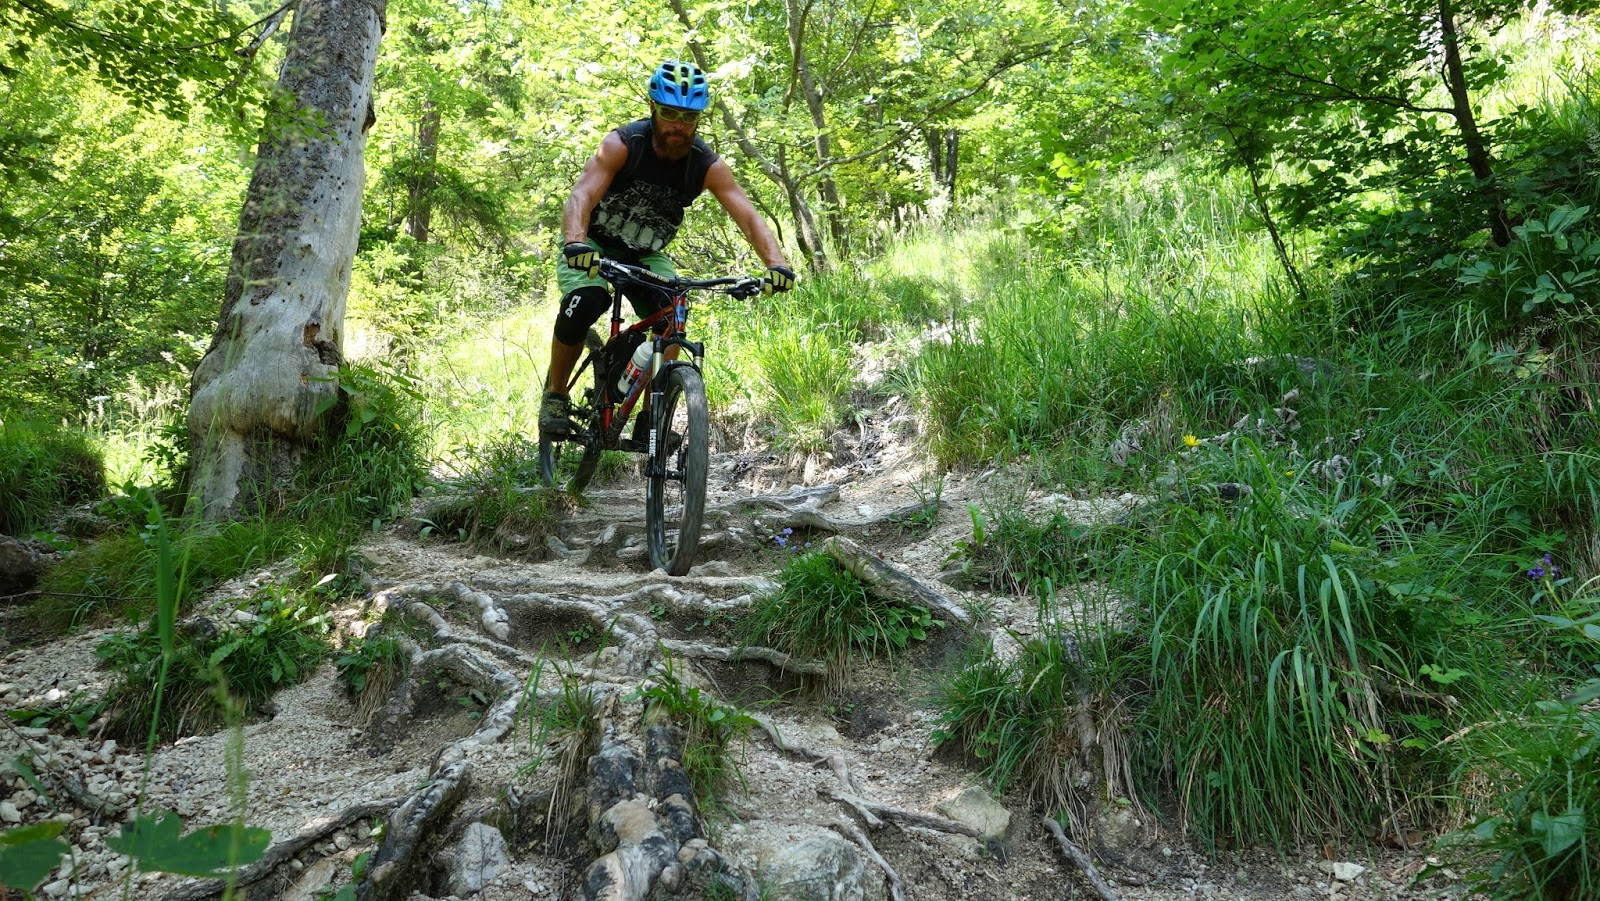 Technischer Trail Inntal Feuerköpfl (Buchacker) - FIREHEAD :) MTB